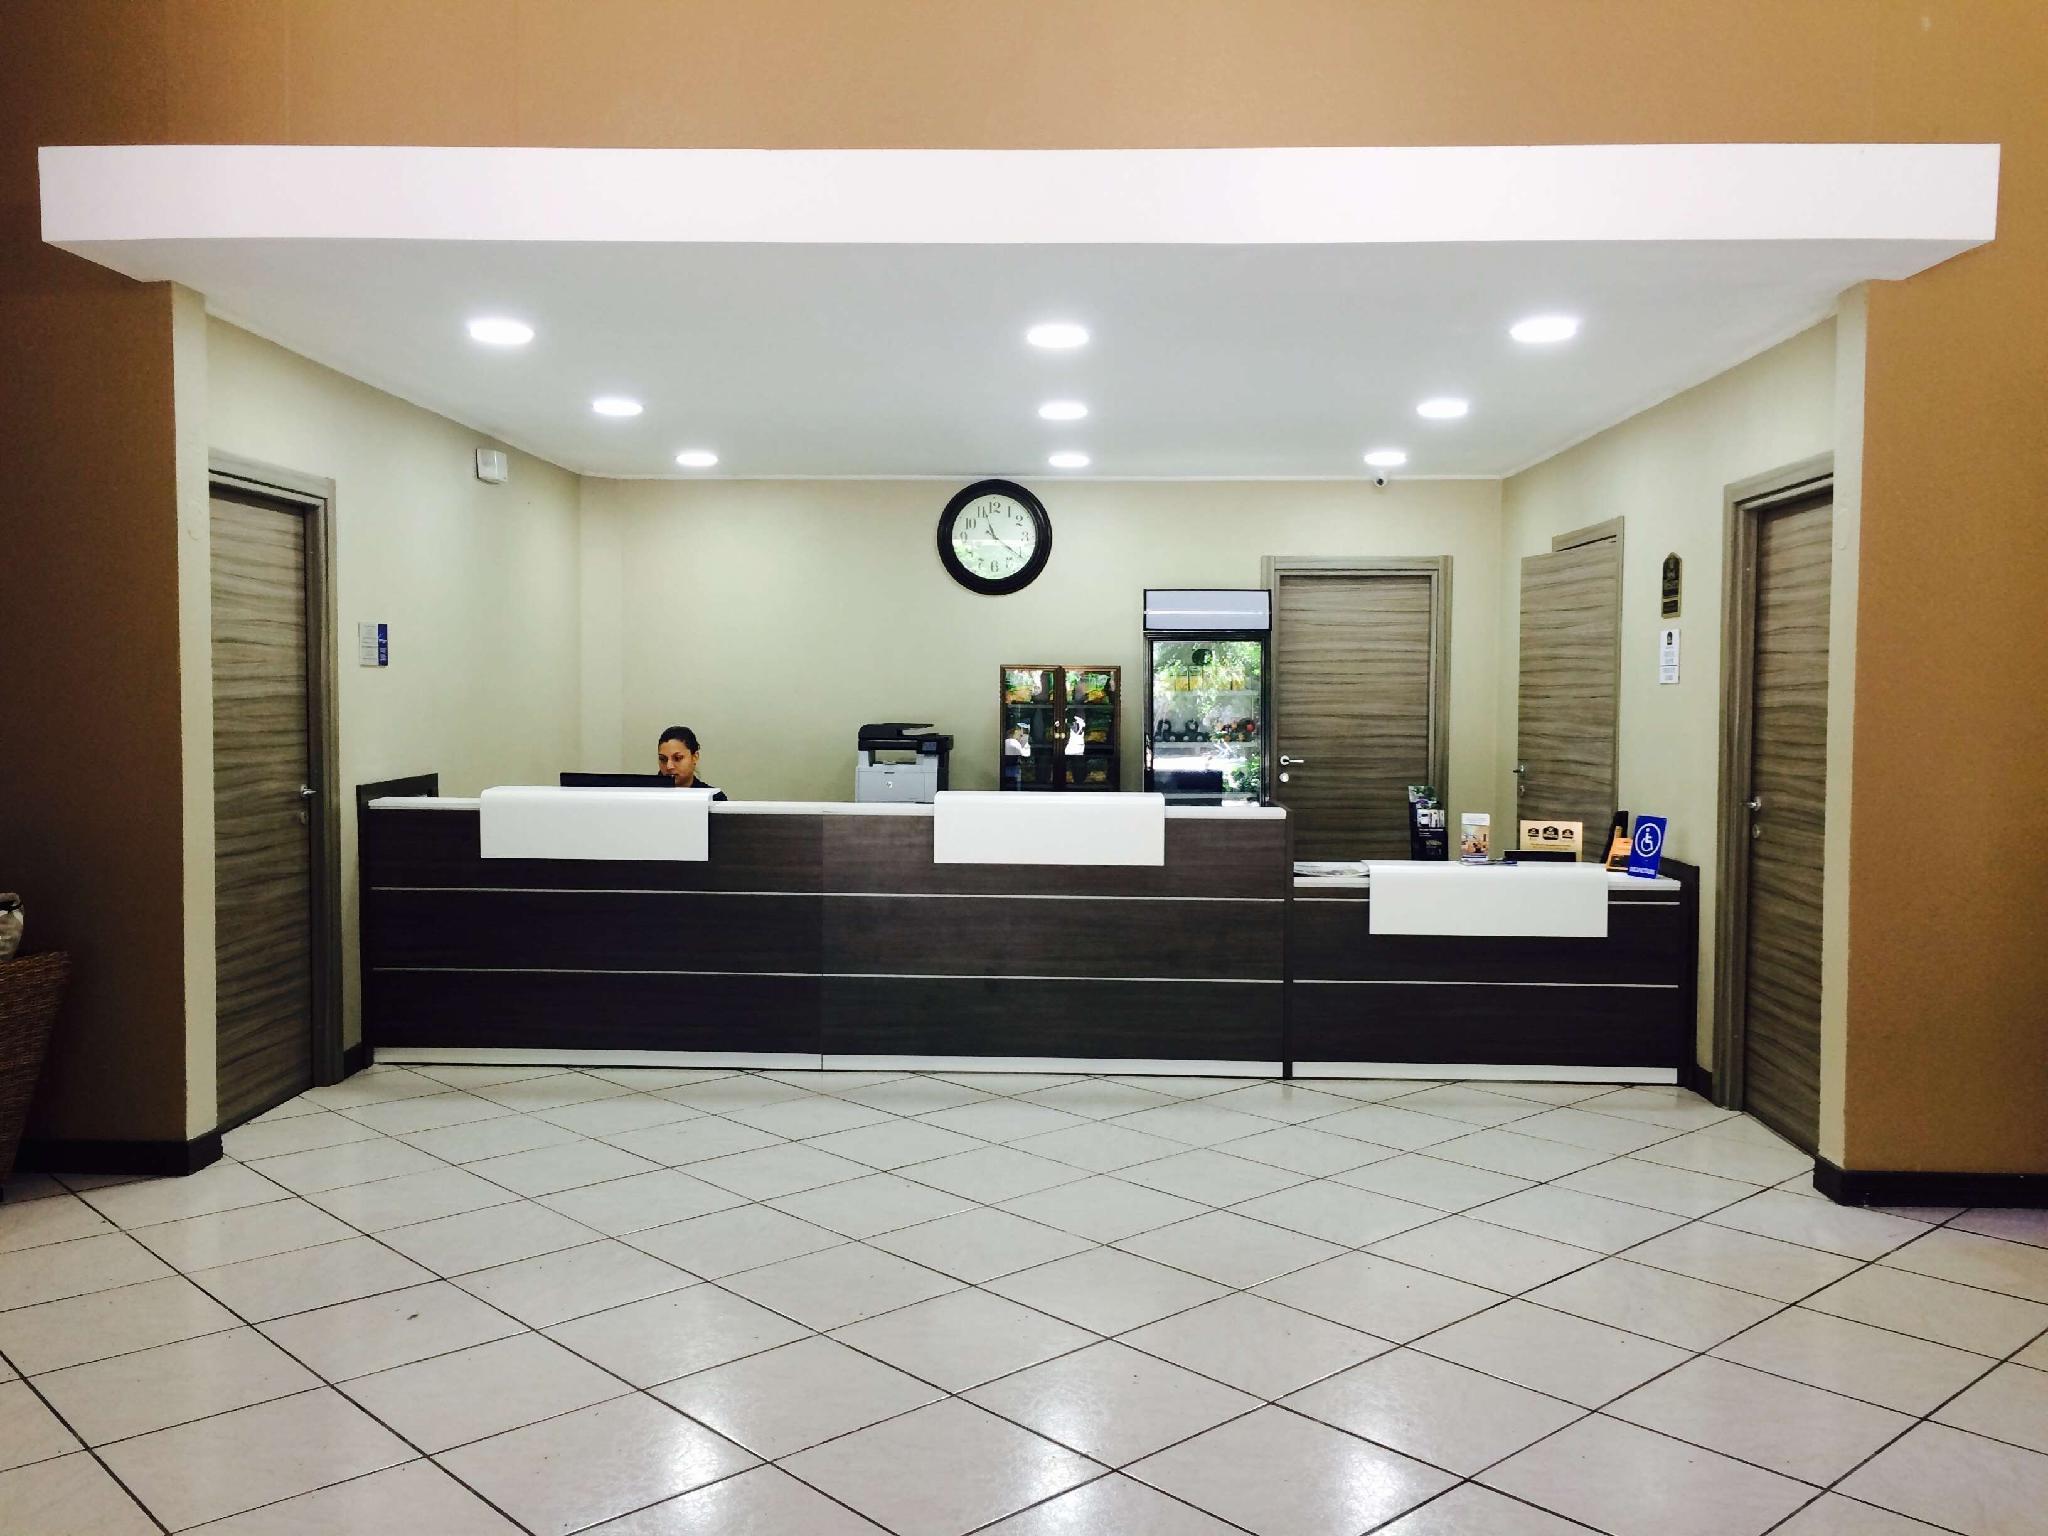 BEST WESTERN EL SITIO HOTEL & CASINO, Liberia